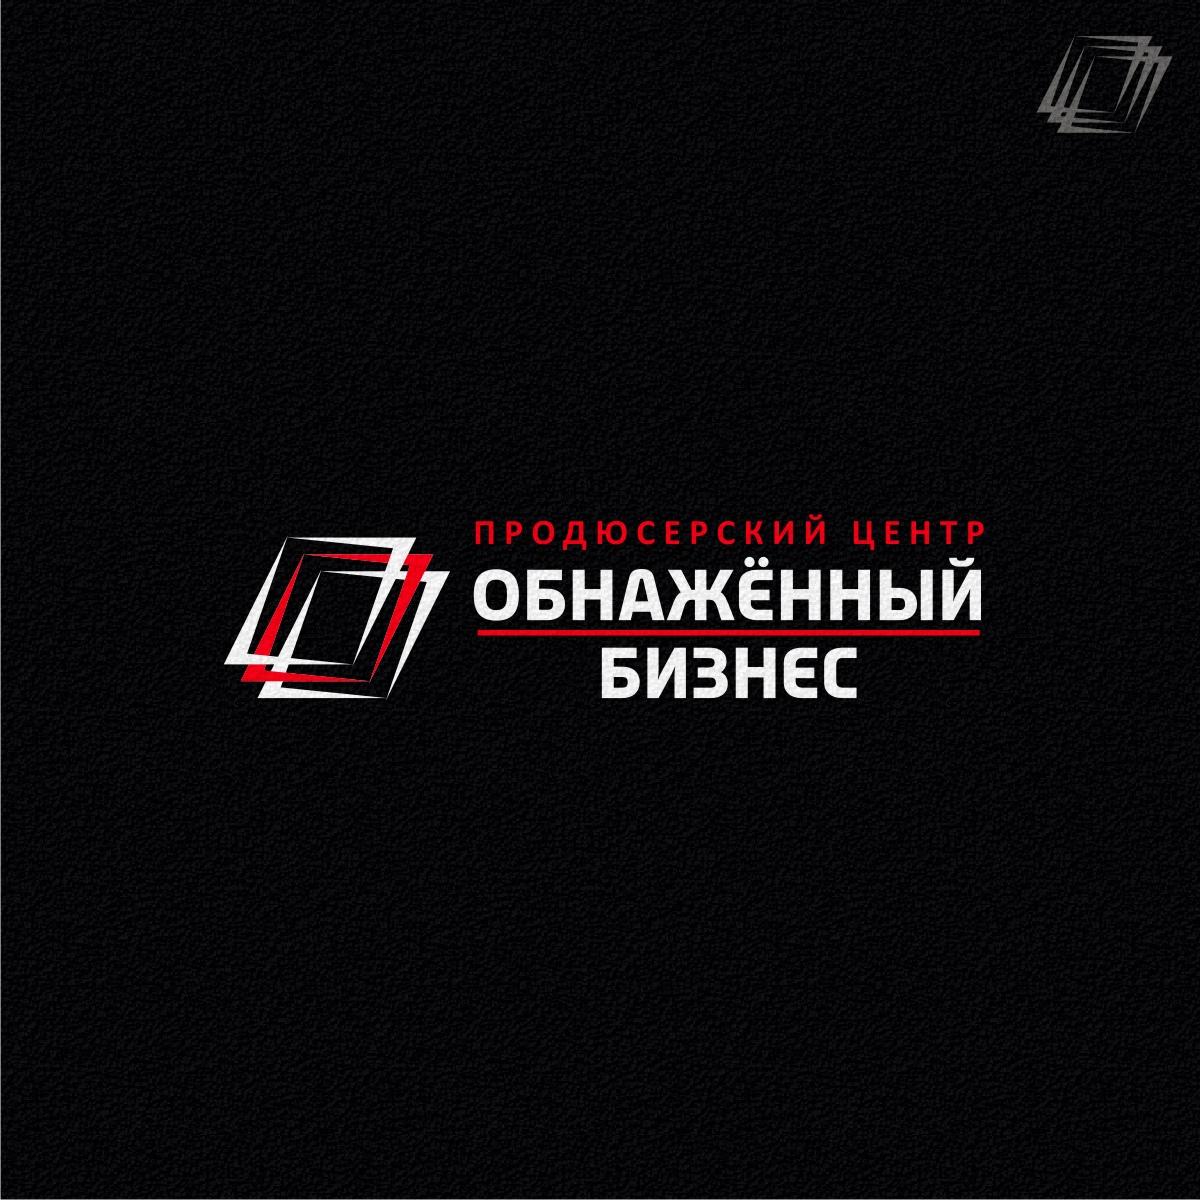 "Логотип для продюсерского центра ""Обнажённый бизнес"" фото f_3095ba4d729bf7d3.jpg"